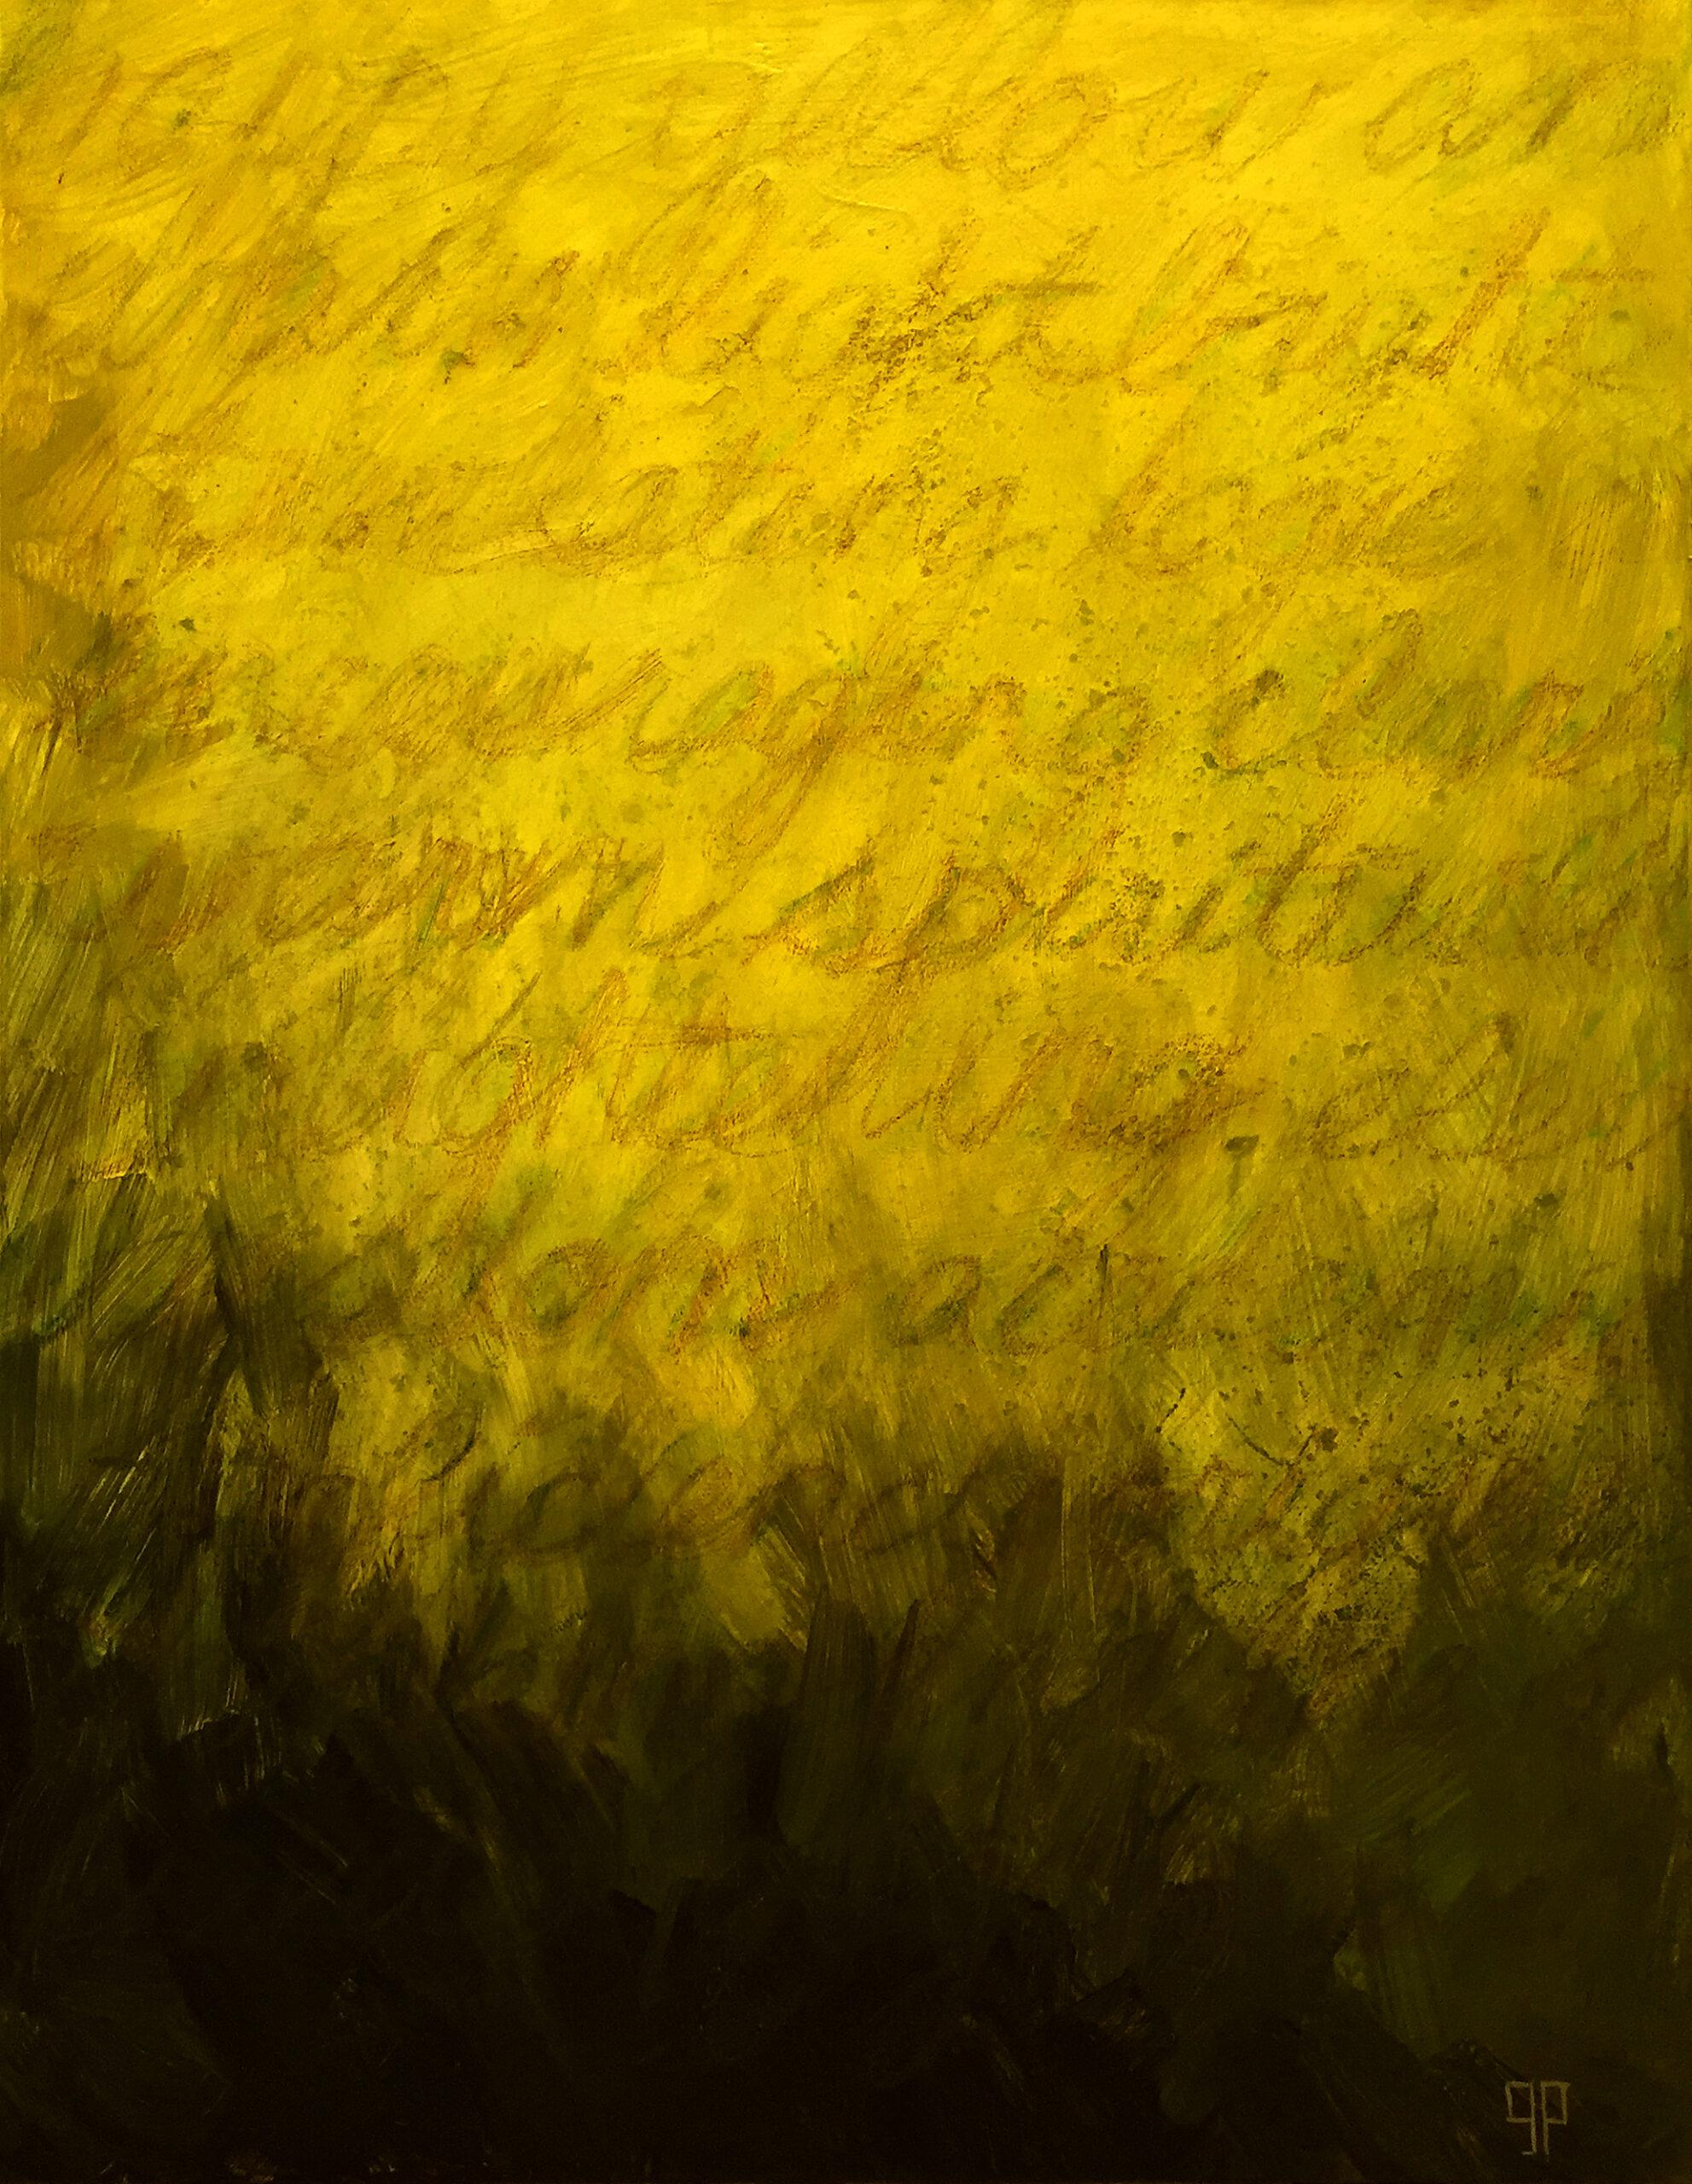 """Yellow"" acrylic on canvas 16x20"